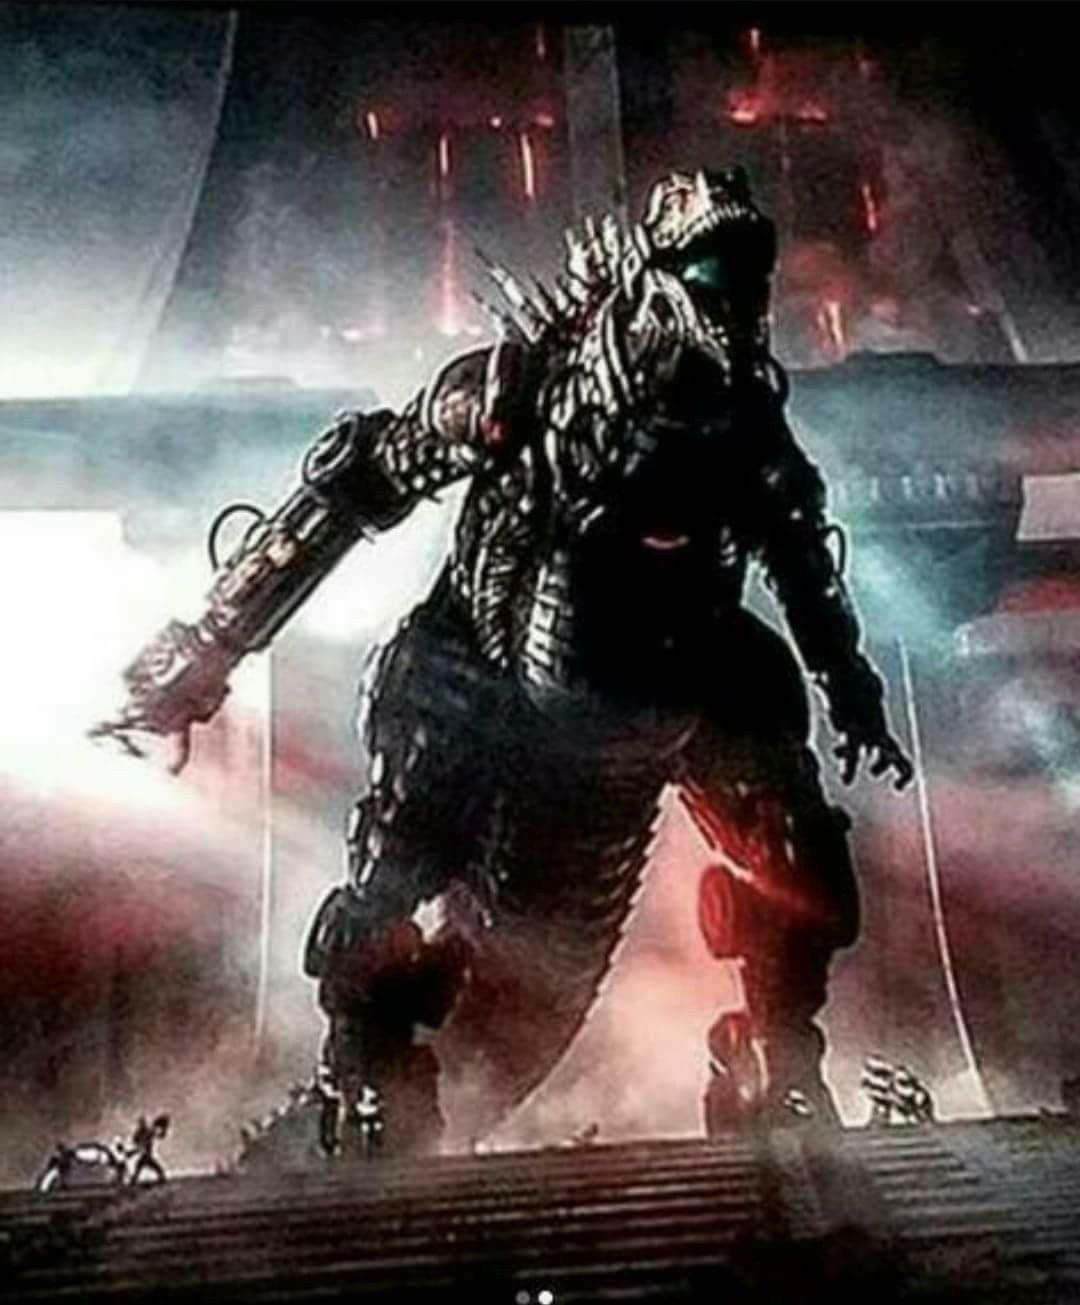 Mechagodzilla In The Movie Ready Player One Kaiju Monsters Giant Monster Movies Godzilla Franchise